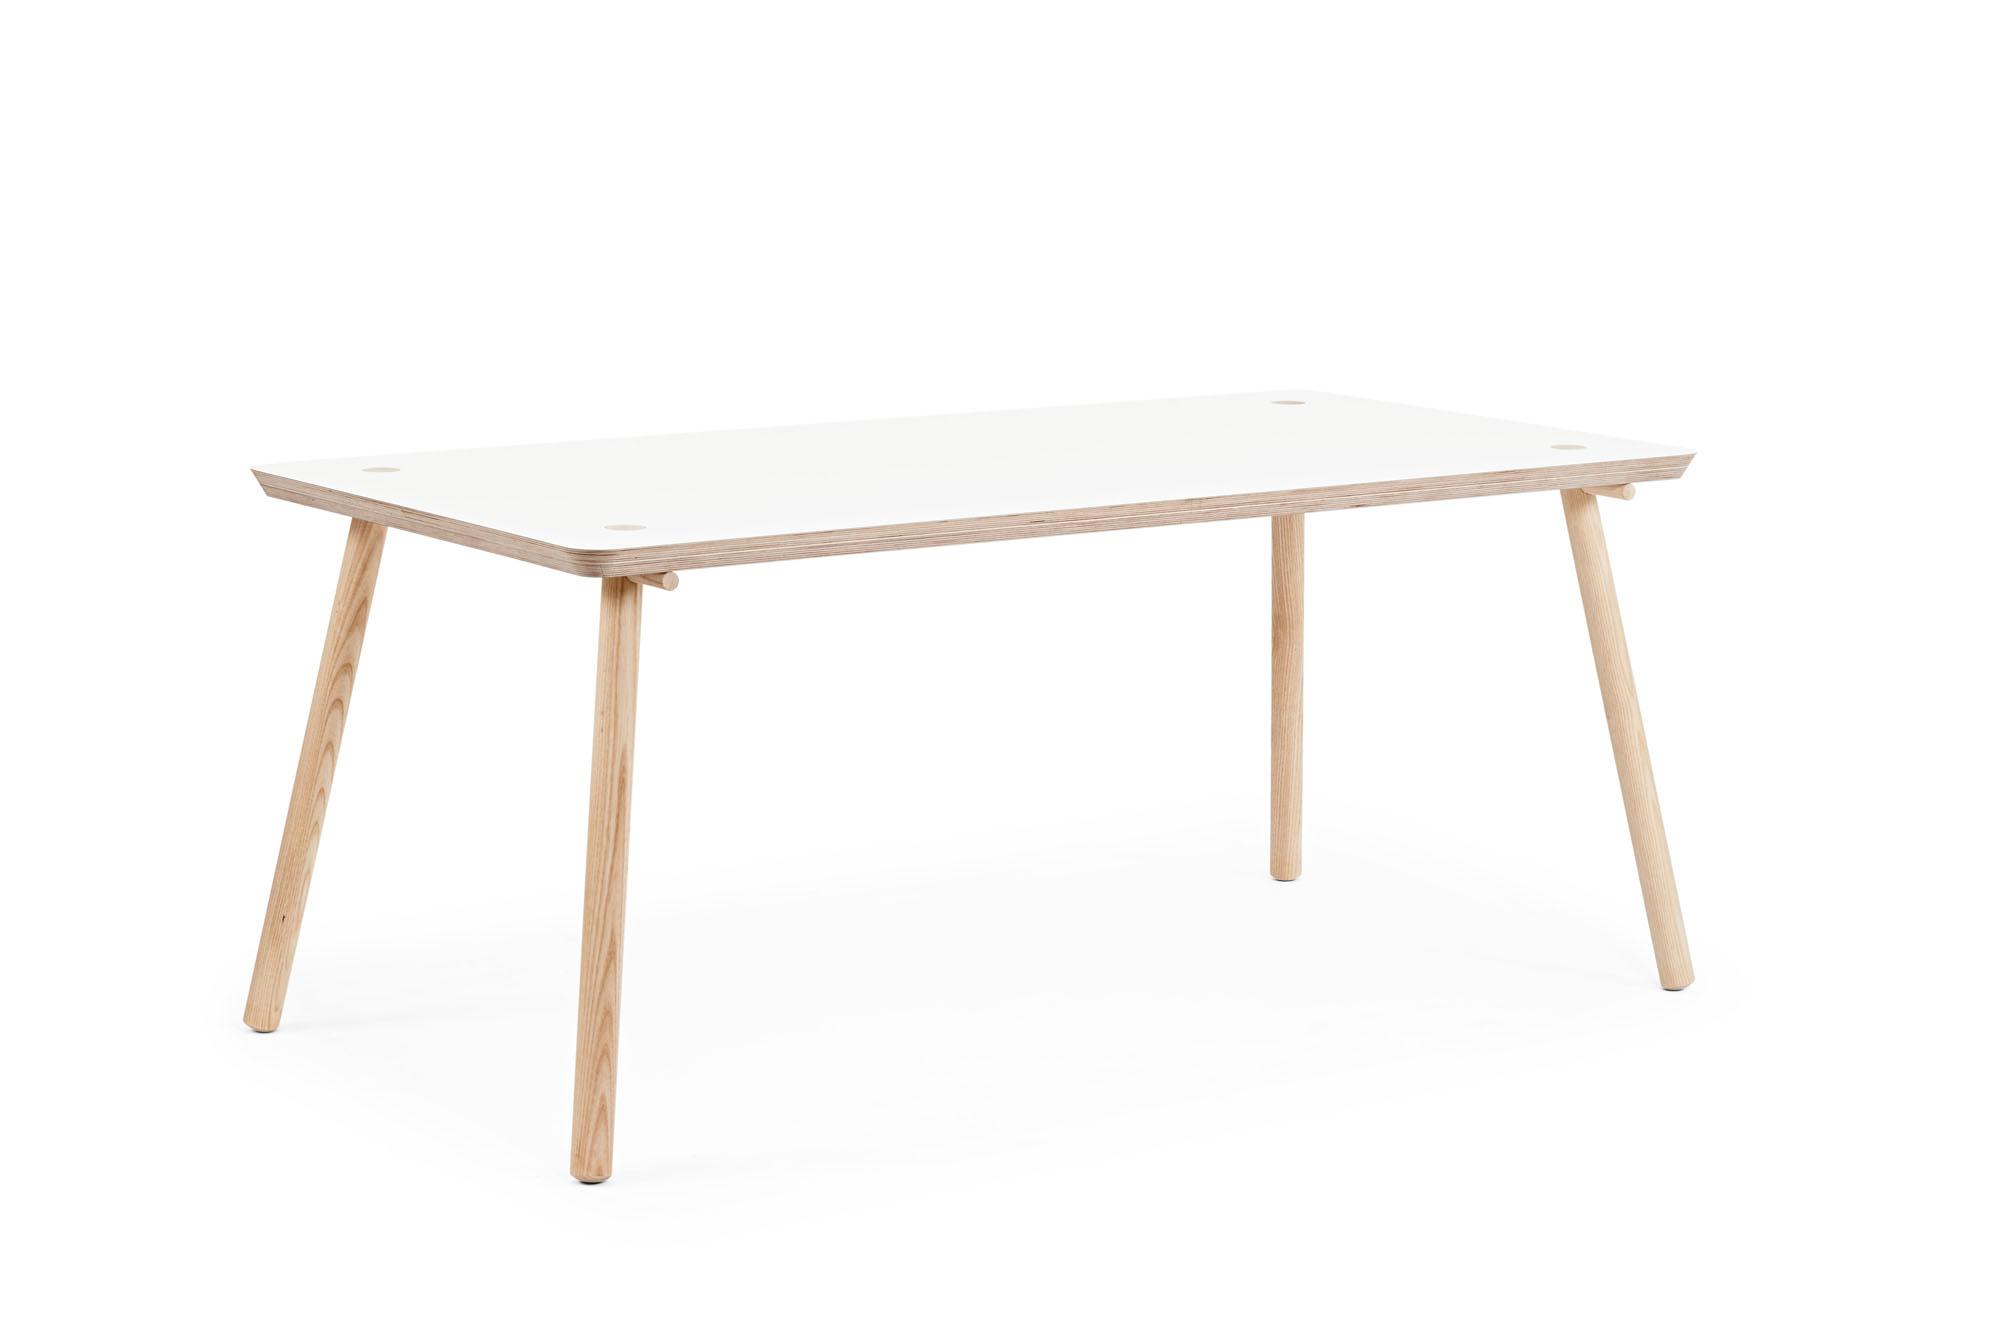 https://www.gimmii.nl/wp-content/uploads/2015/12/stip-tafel-reinier-de-jong-hpl.jpg